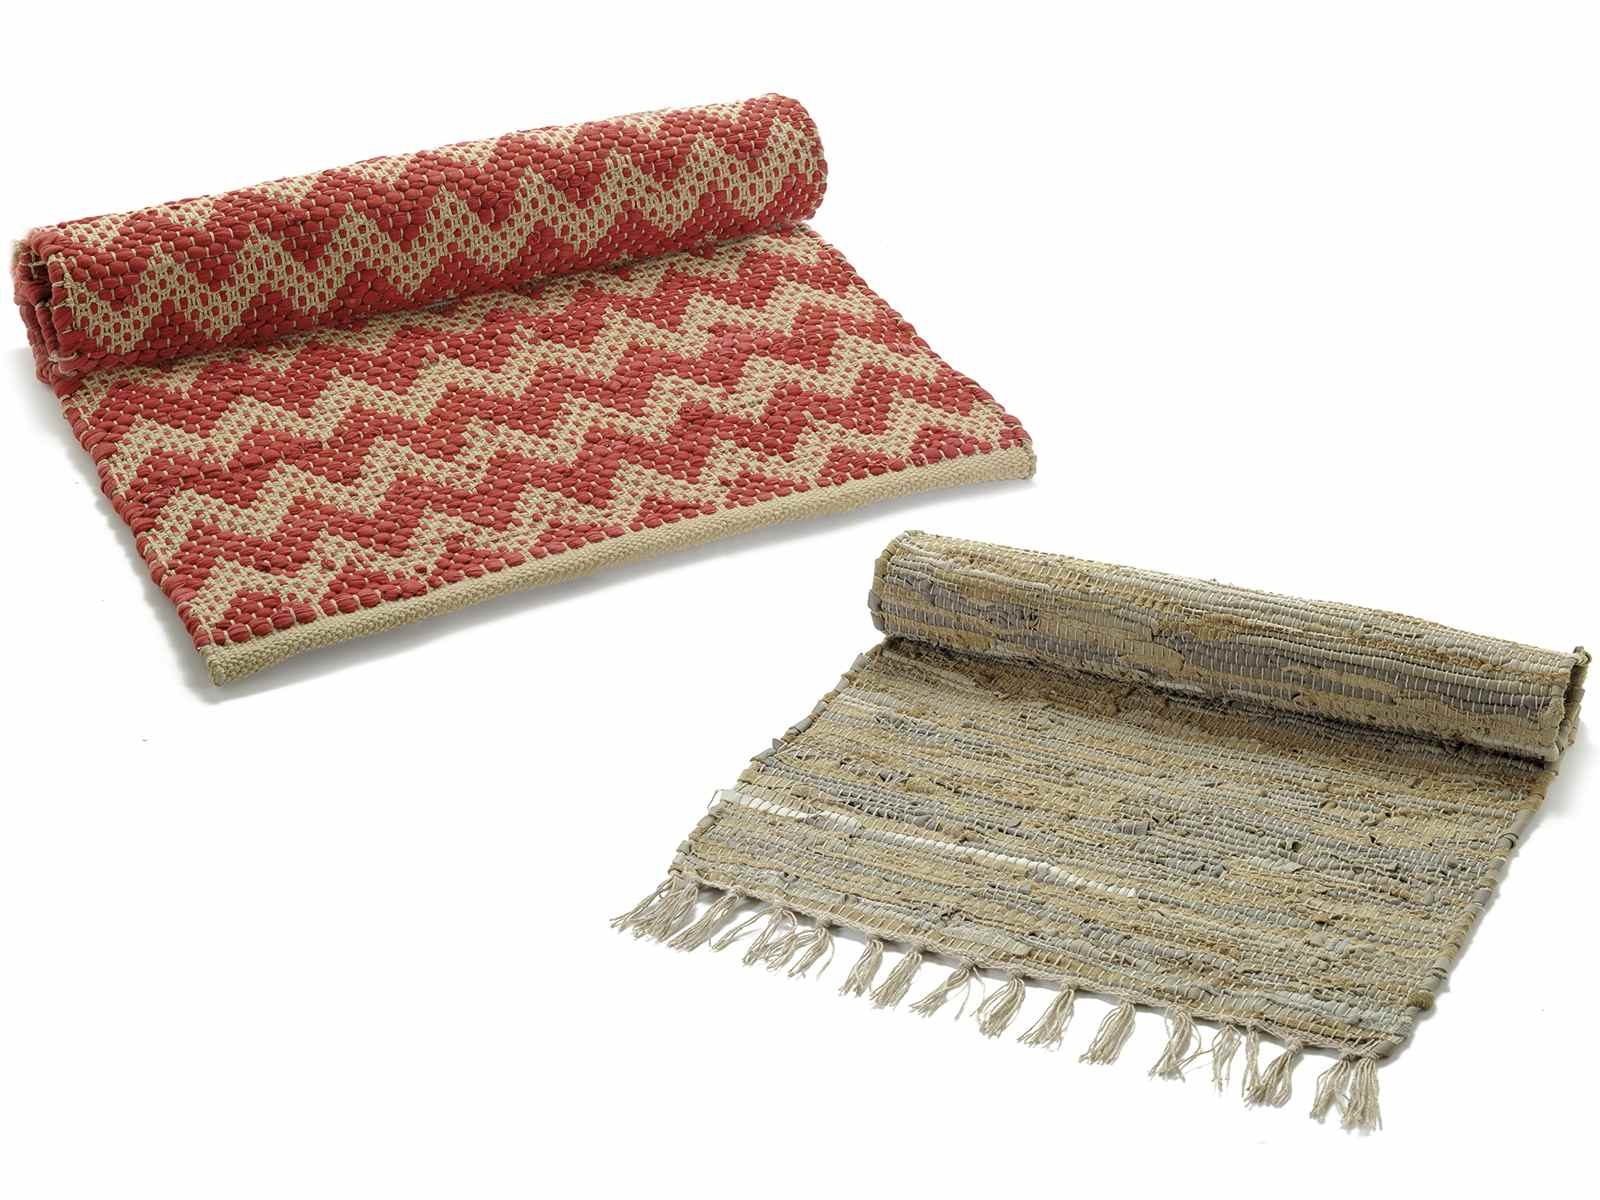 Tappeto in cotone, pelle e corda (45.01.18) - Art From Italy